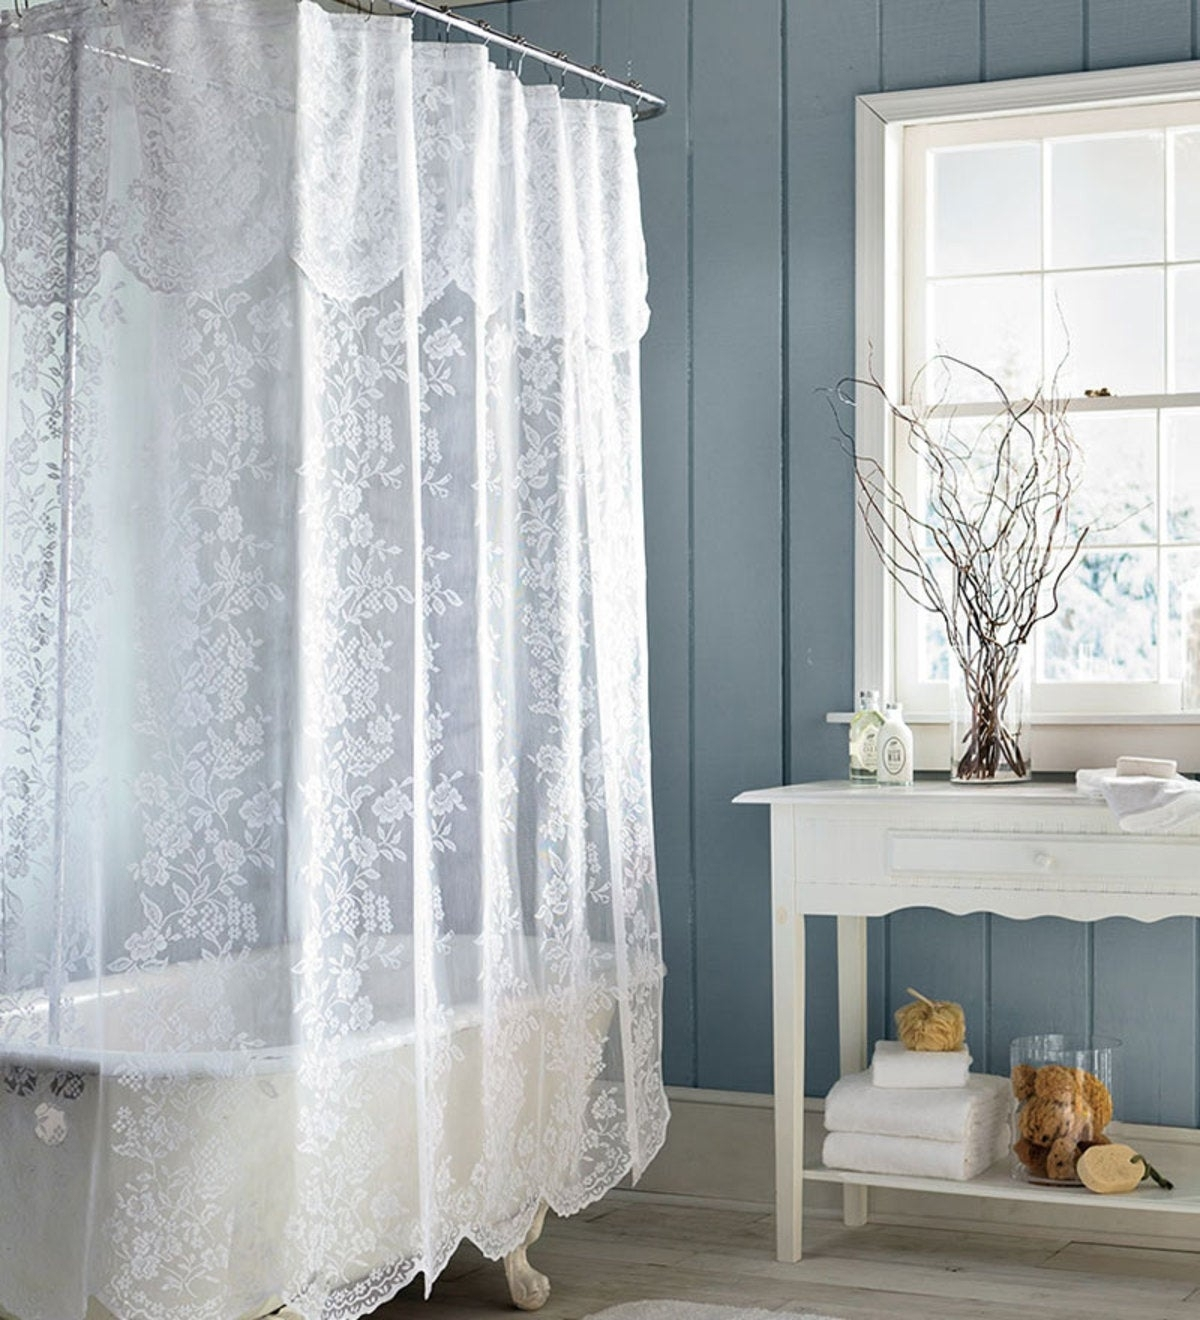 sheer shower curtain ideas on foter